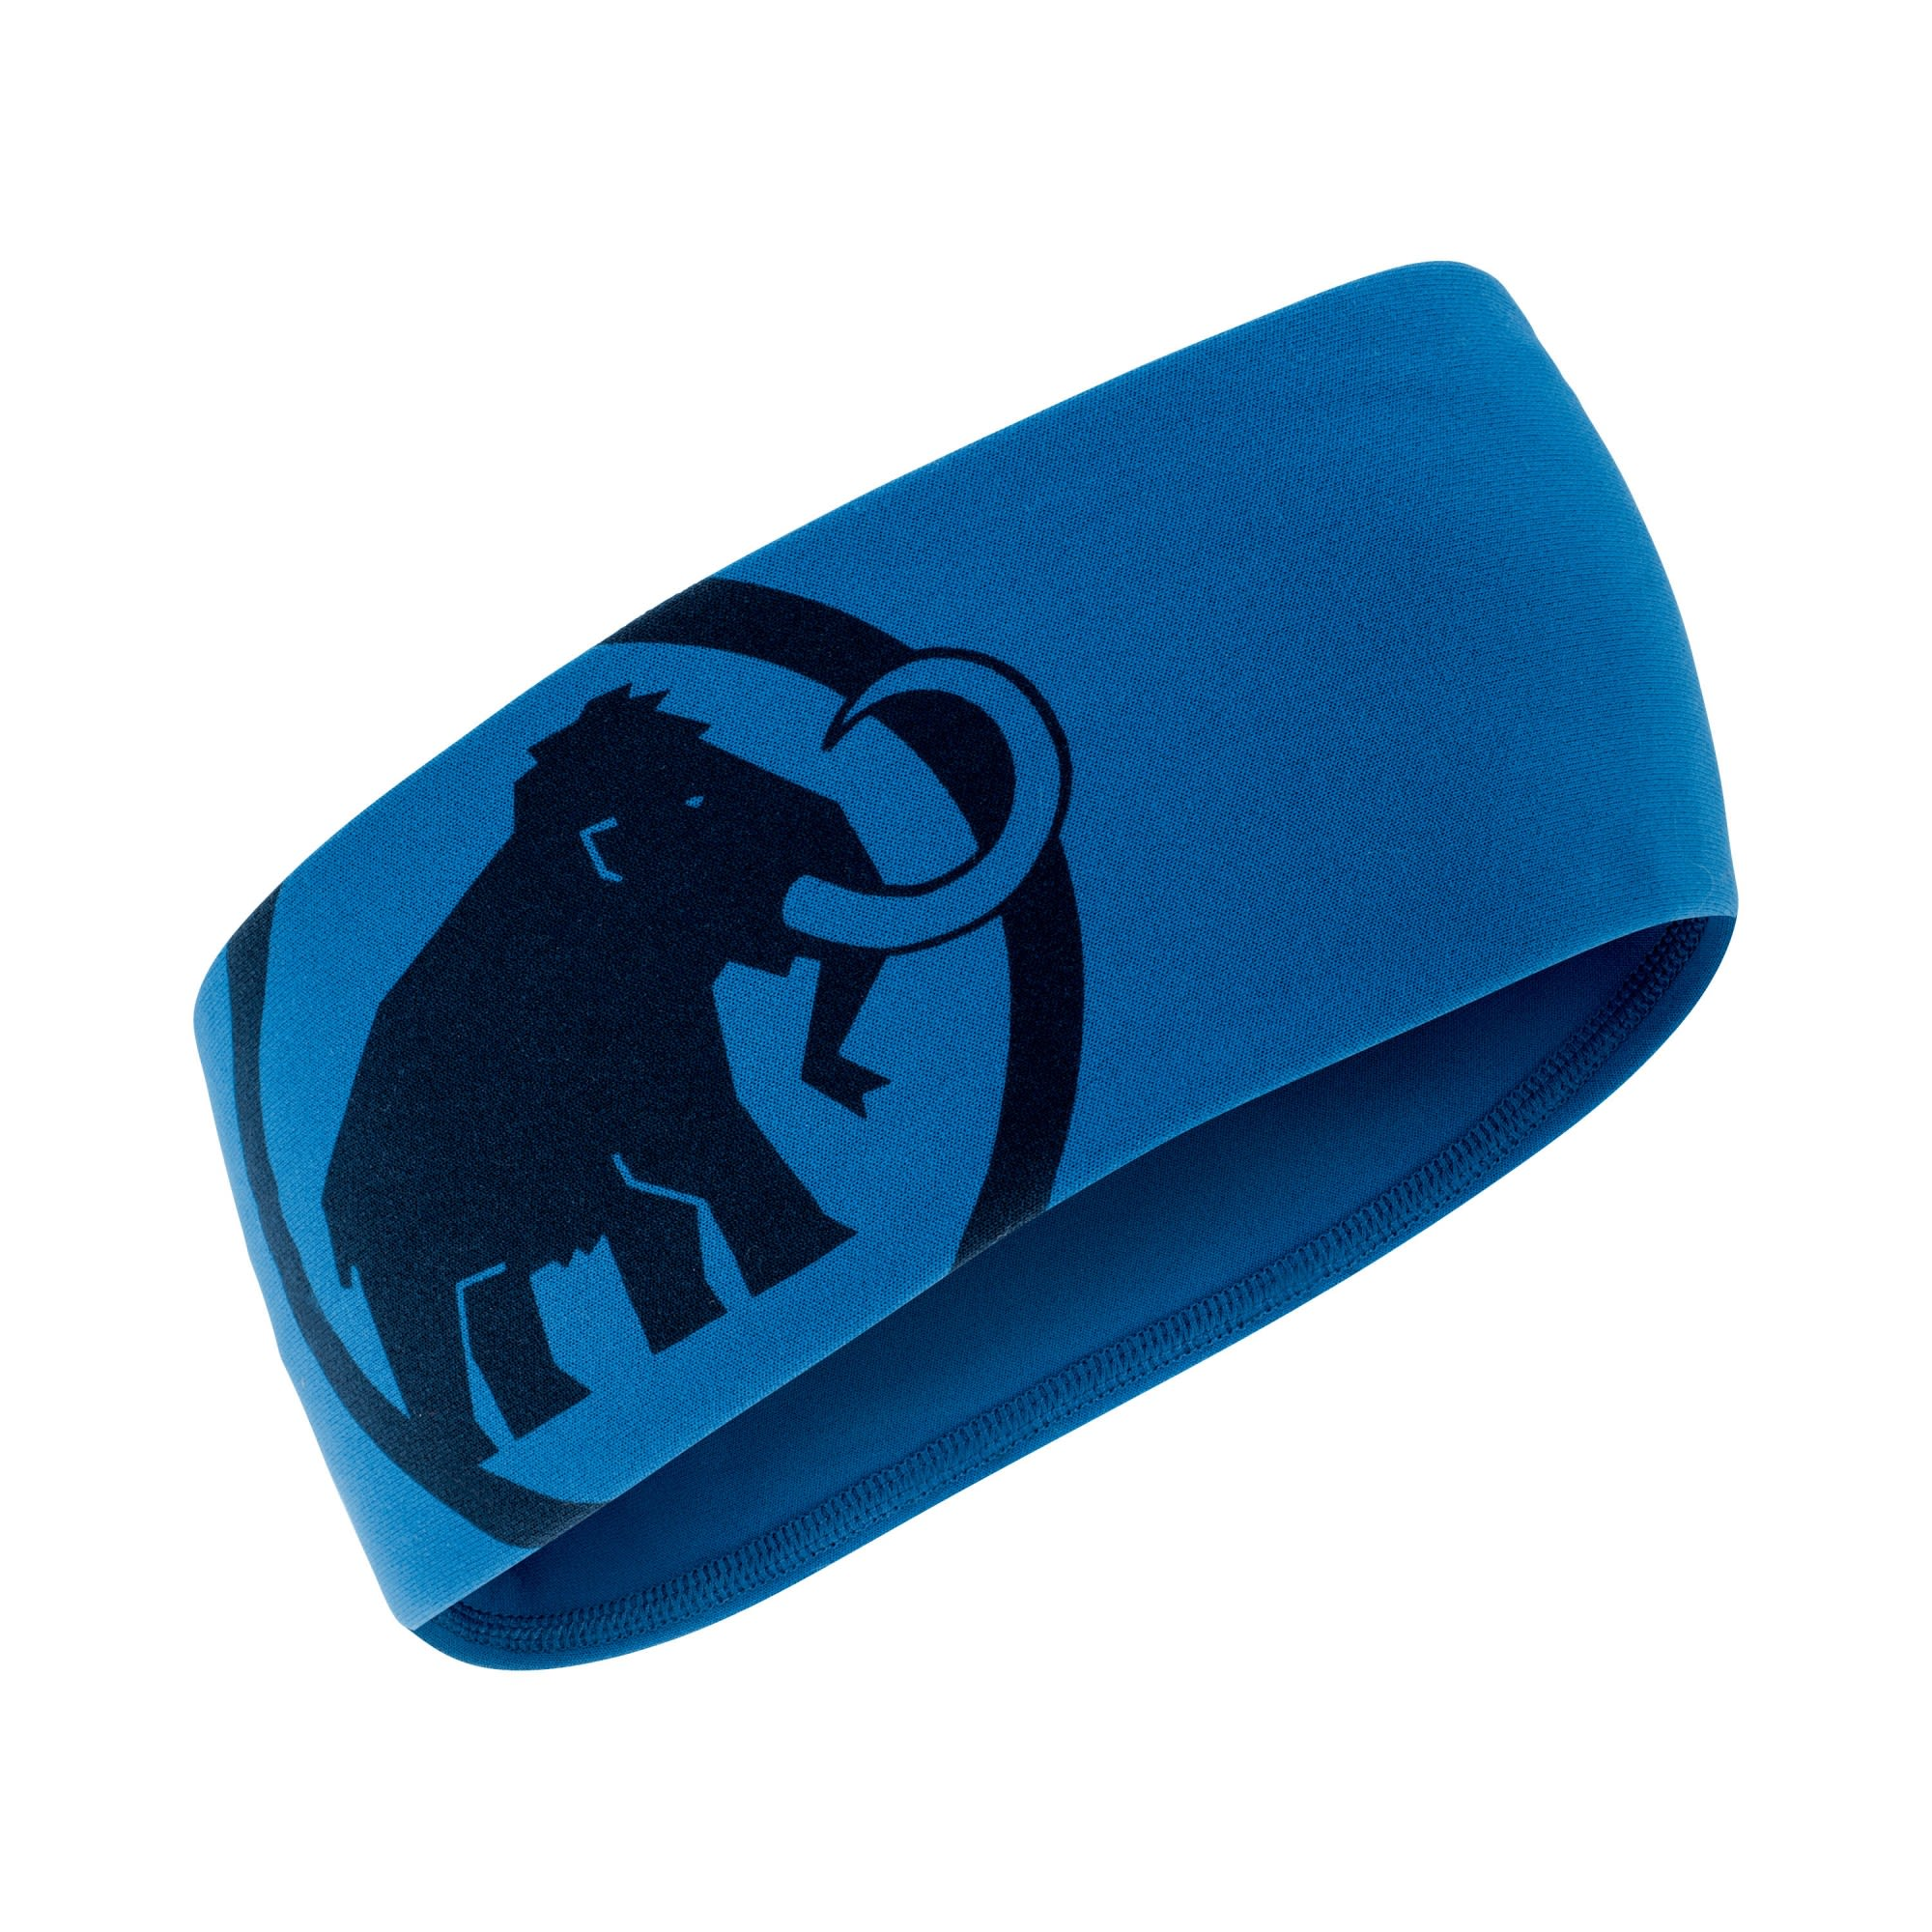 Mammut Aenergy Headband Blau, Accessoires, One Size